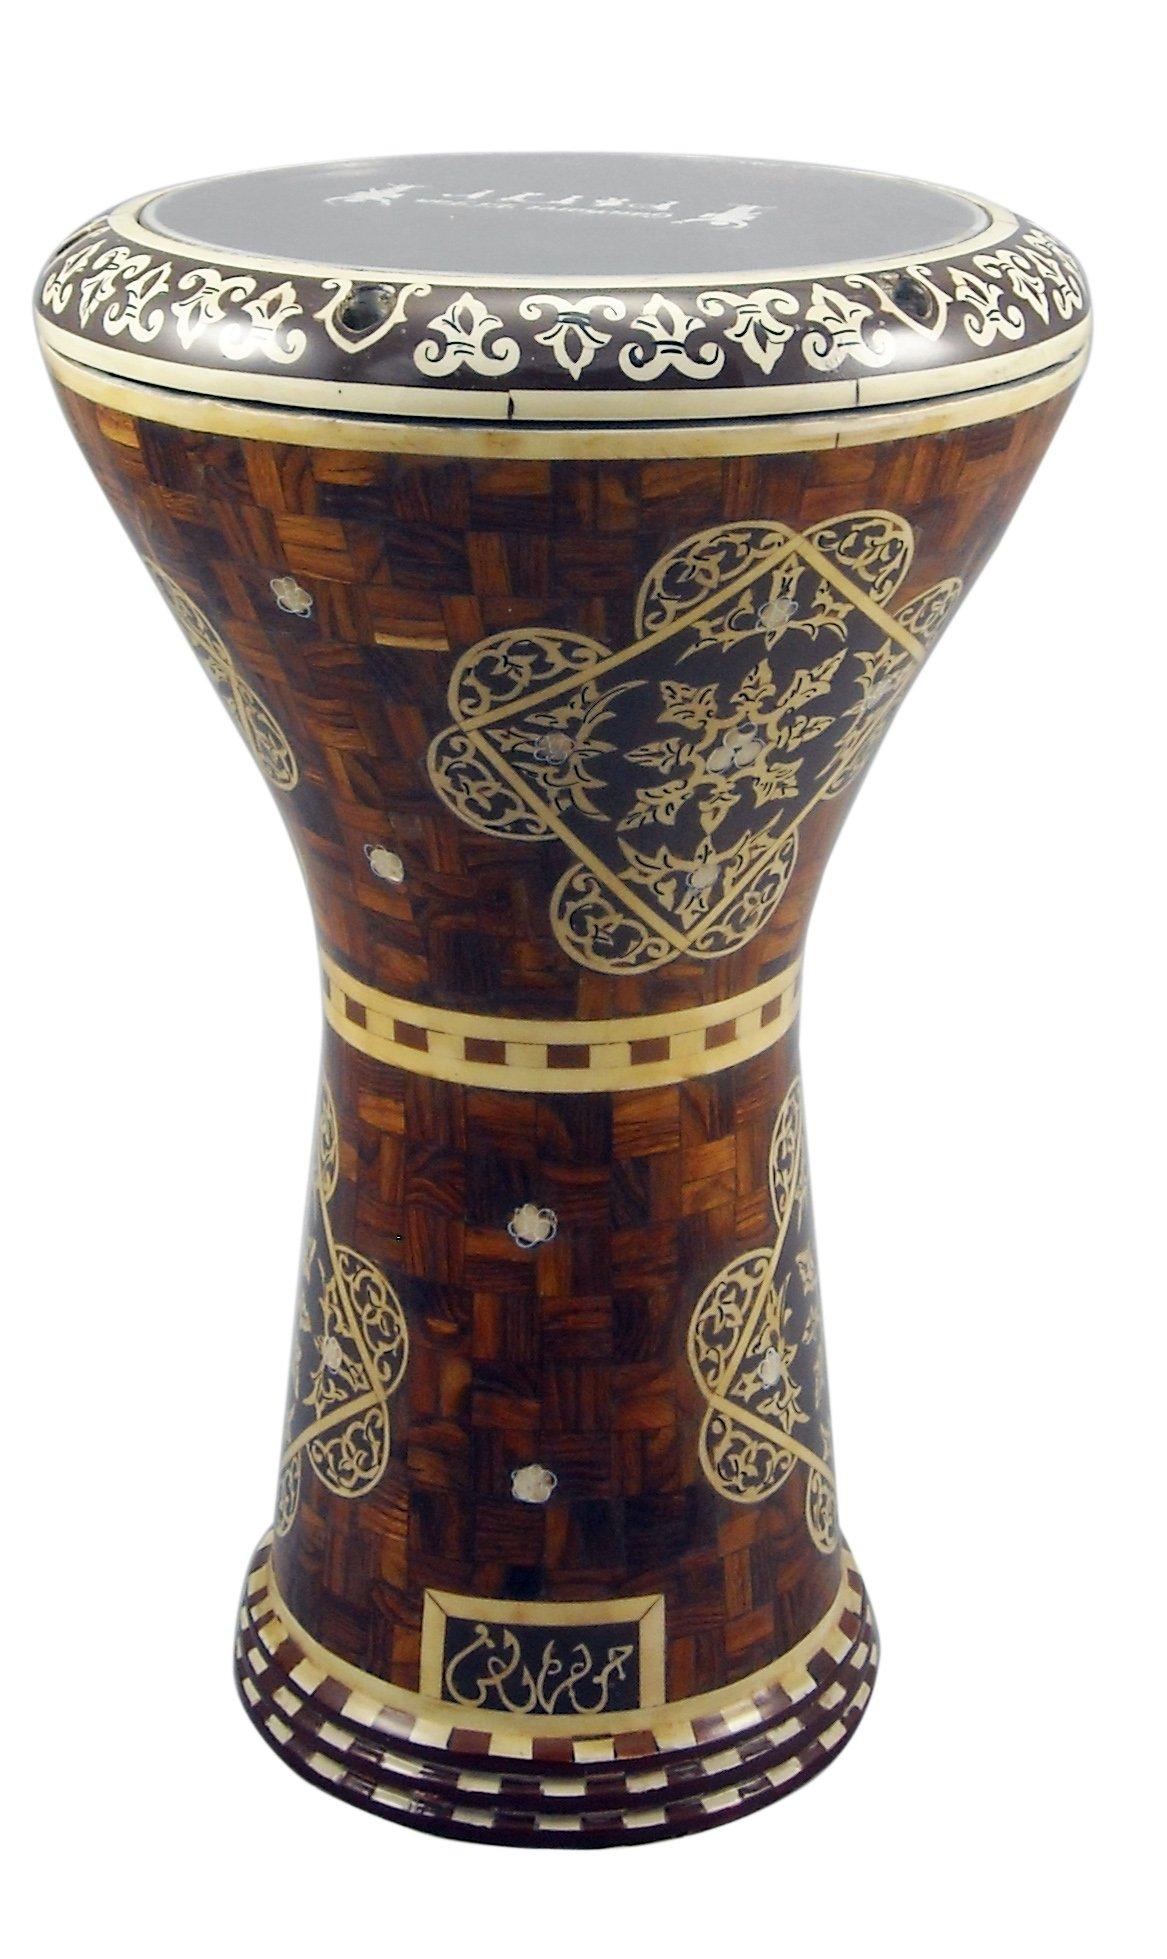 Gawharet El Fan Drum DOUMBEK 17'' Wooden Design Darbuka Gawharet El Fan Drum DOUMBEK